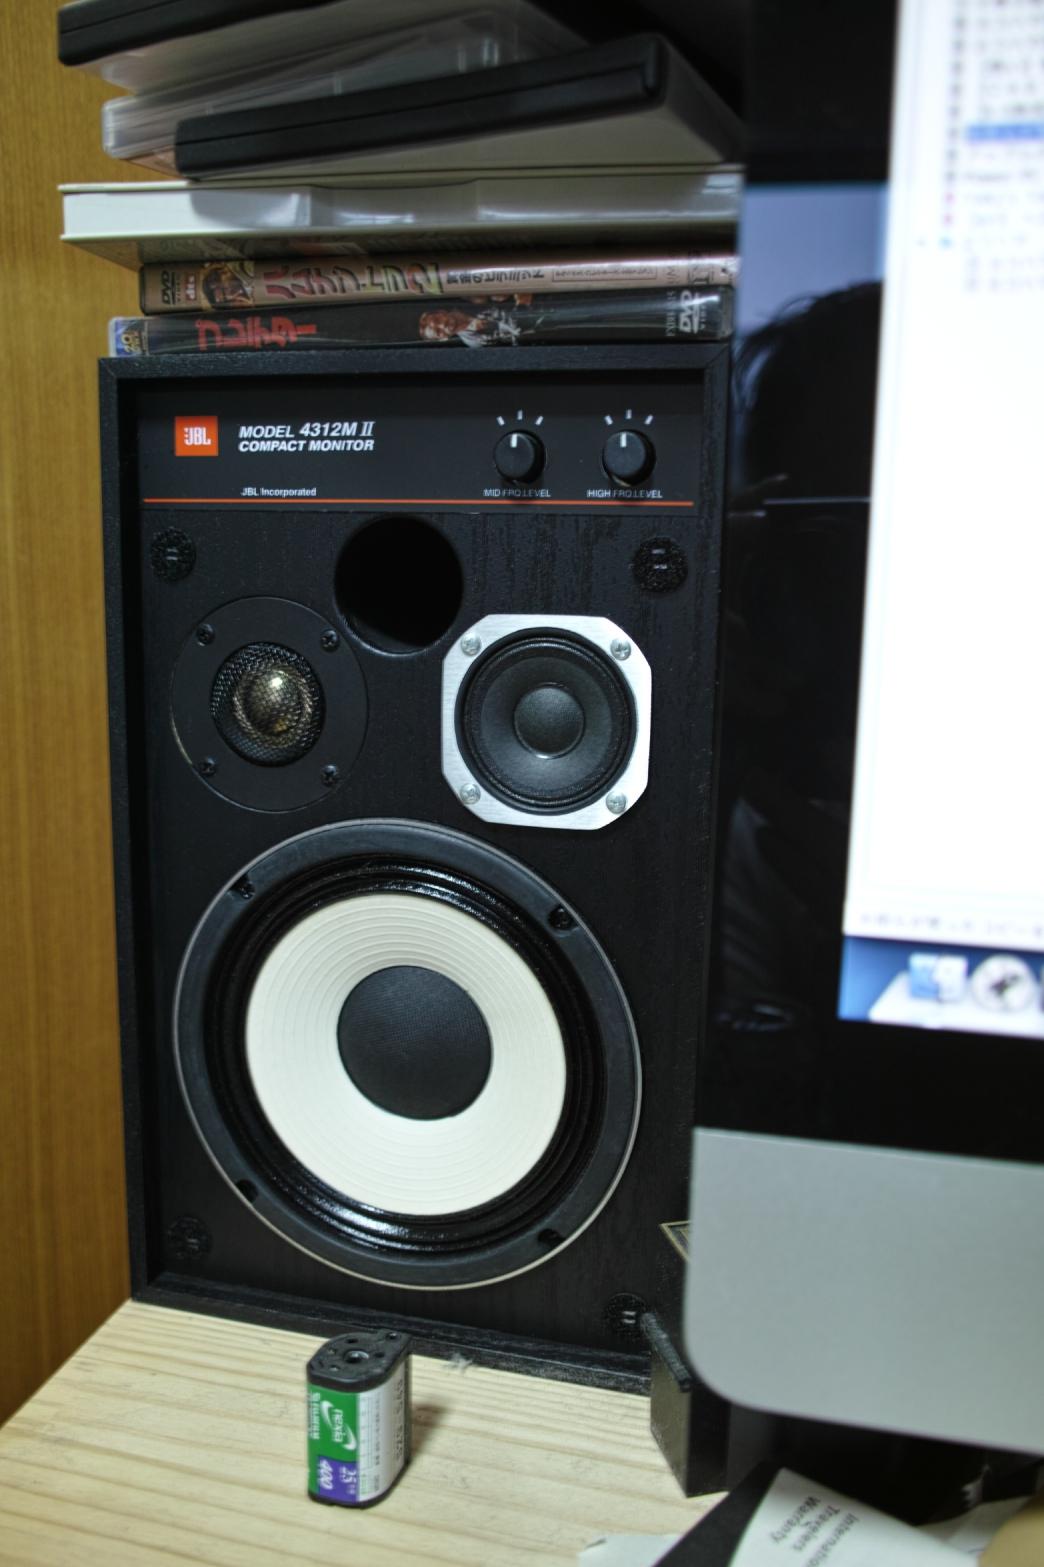 c0019089_20115247.jpg